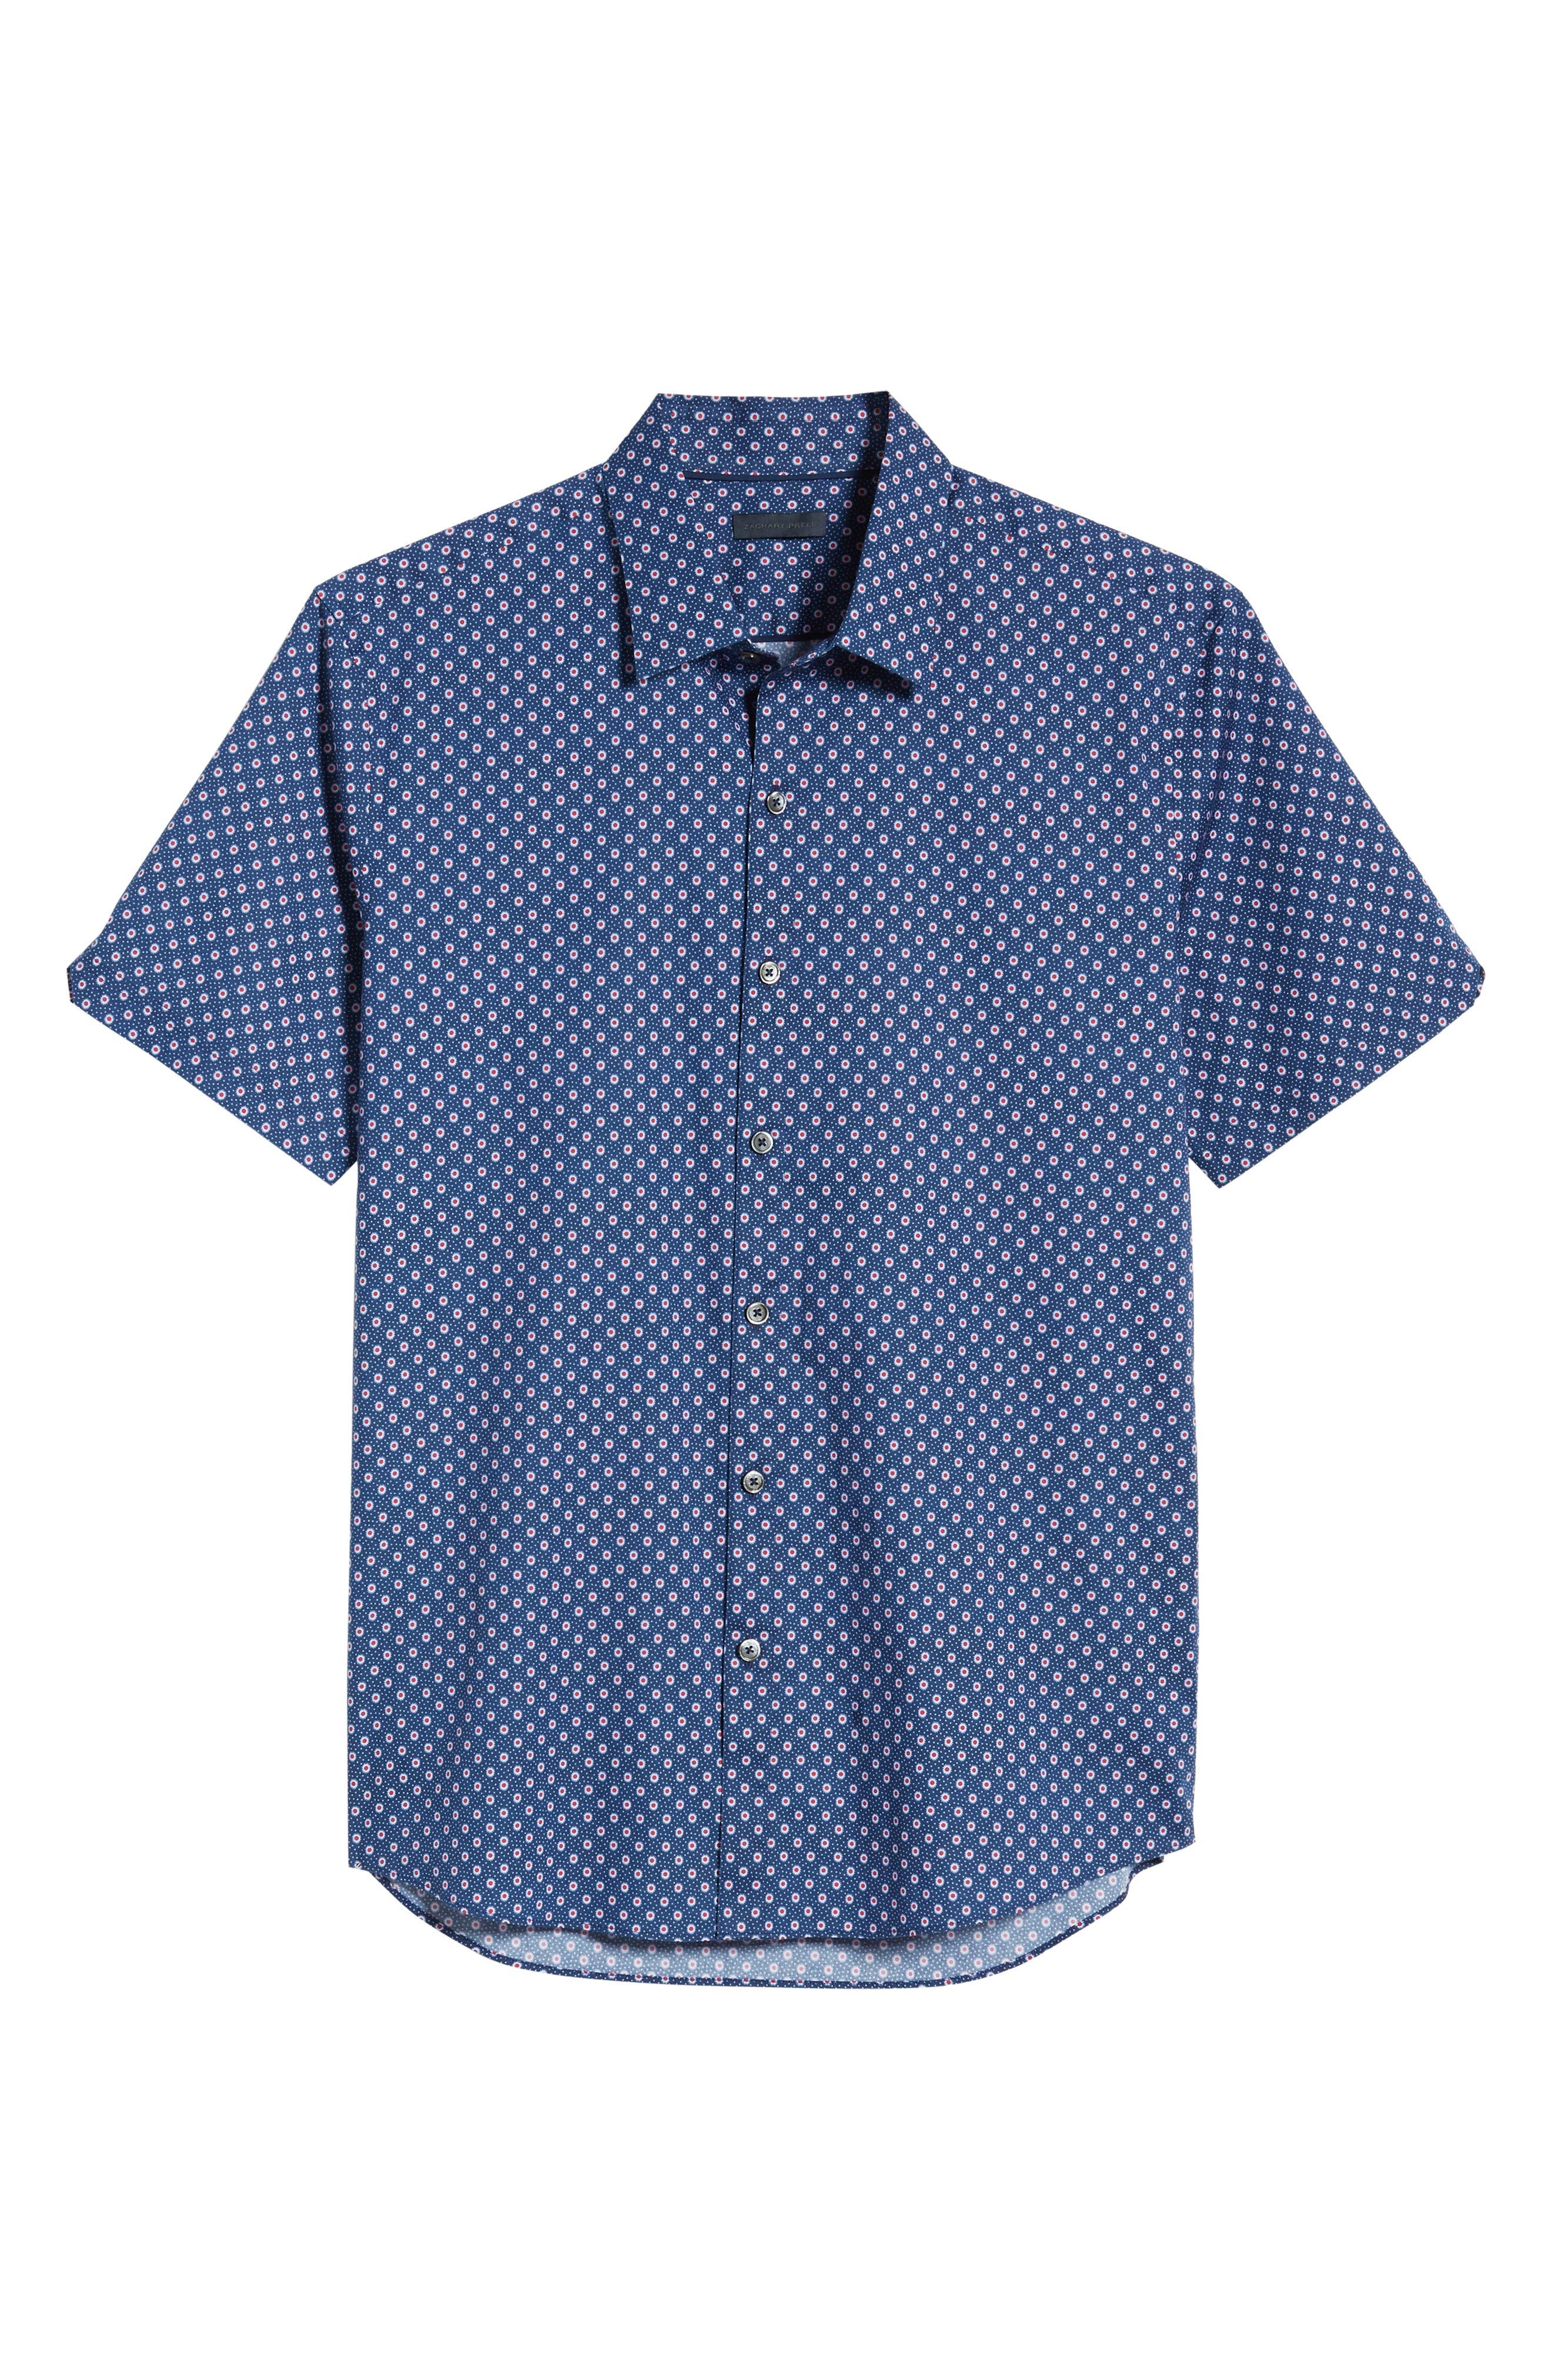 ZACHARY PRELL, Murray Regular Fit Print Sport Shirt, Alternate thumbnail 5, color, BLUE